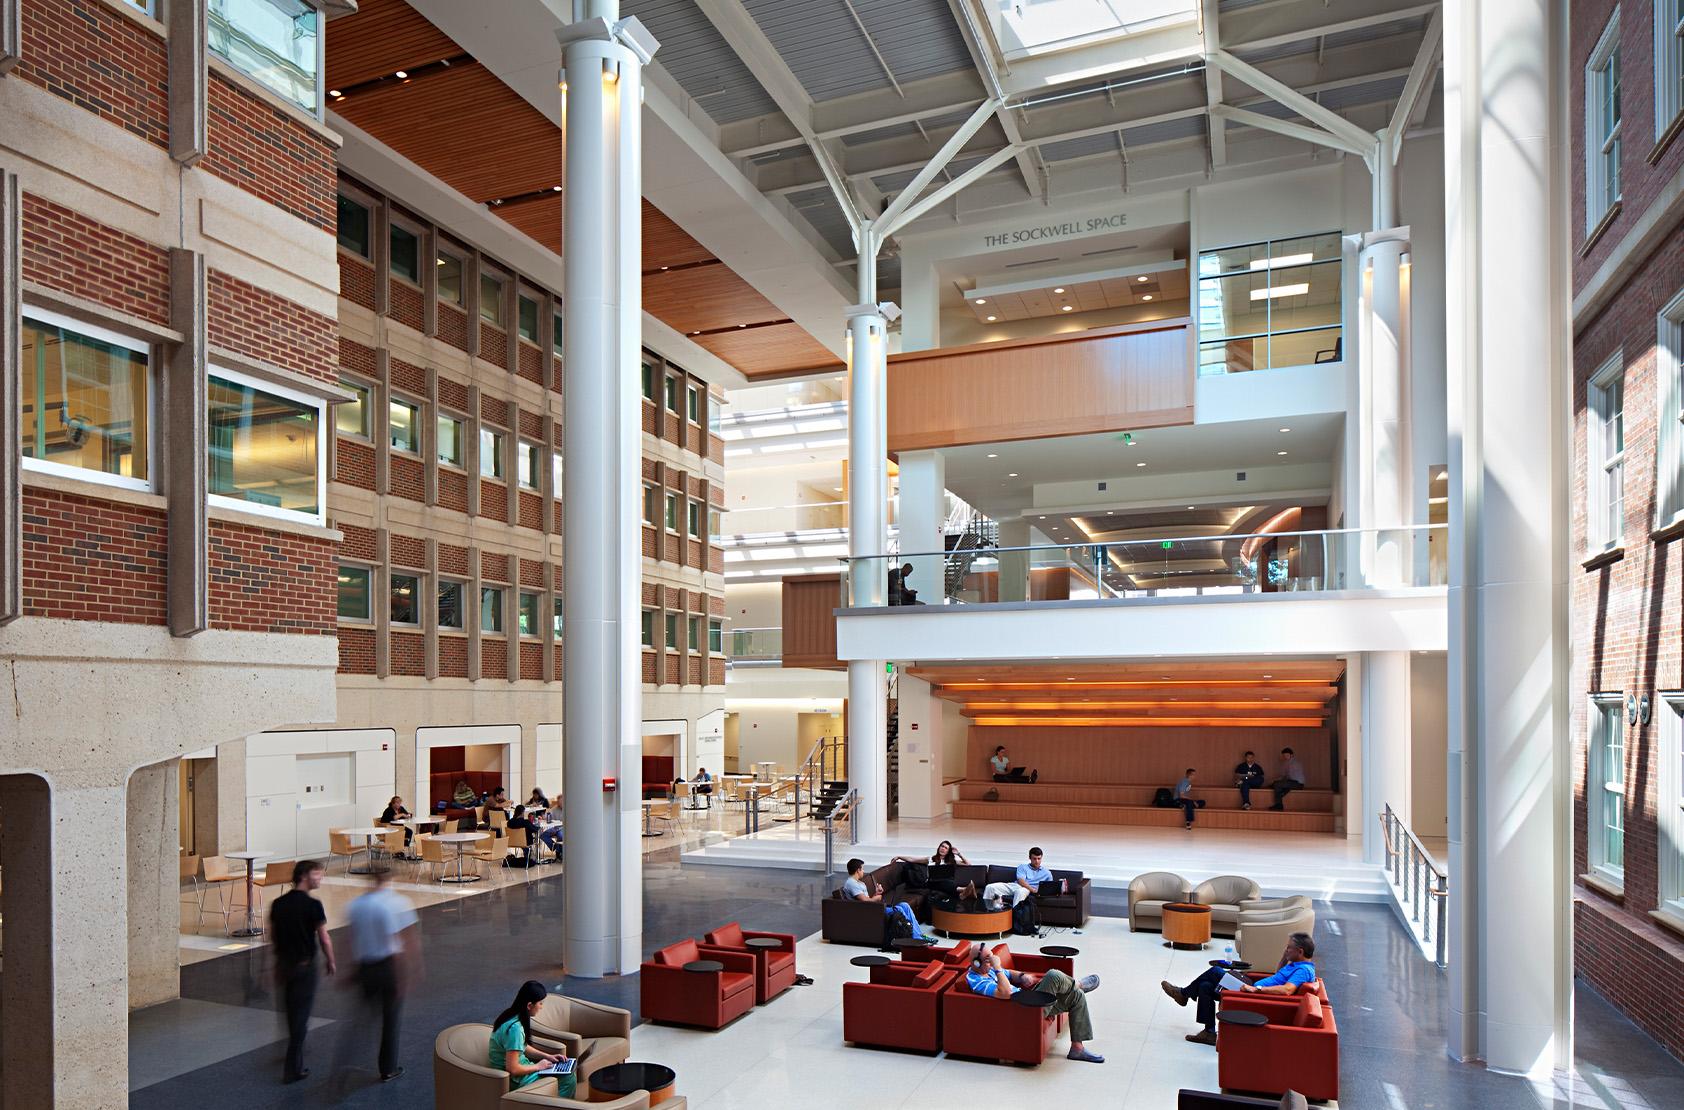 University of North Carolina - Koury Oral Health Sciences Center